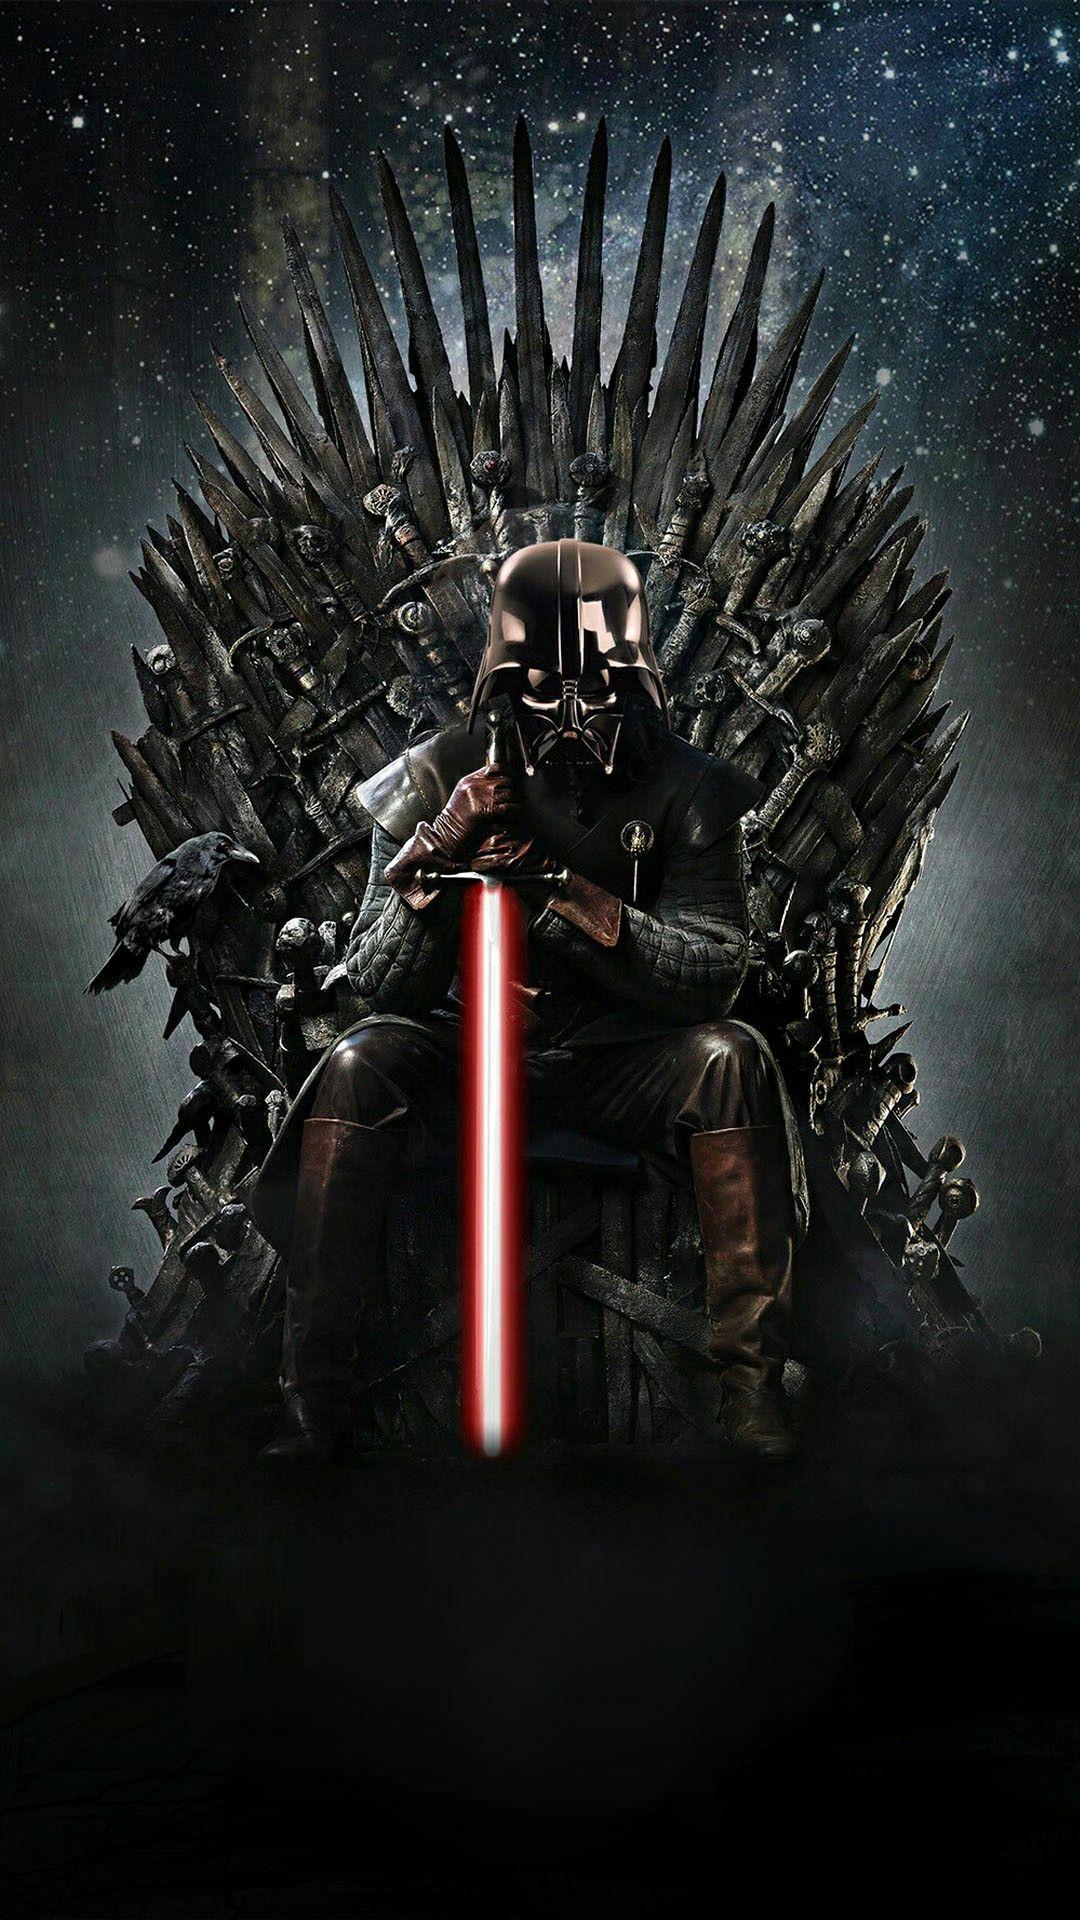 Pin By Carlos L Garcia On Wallpapers Star Wars Art Star Wars Humor Star Wars